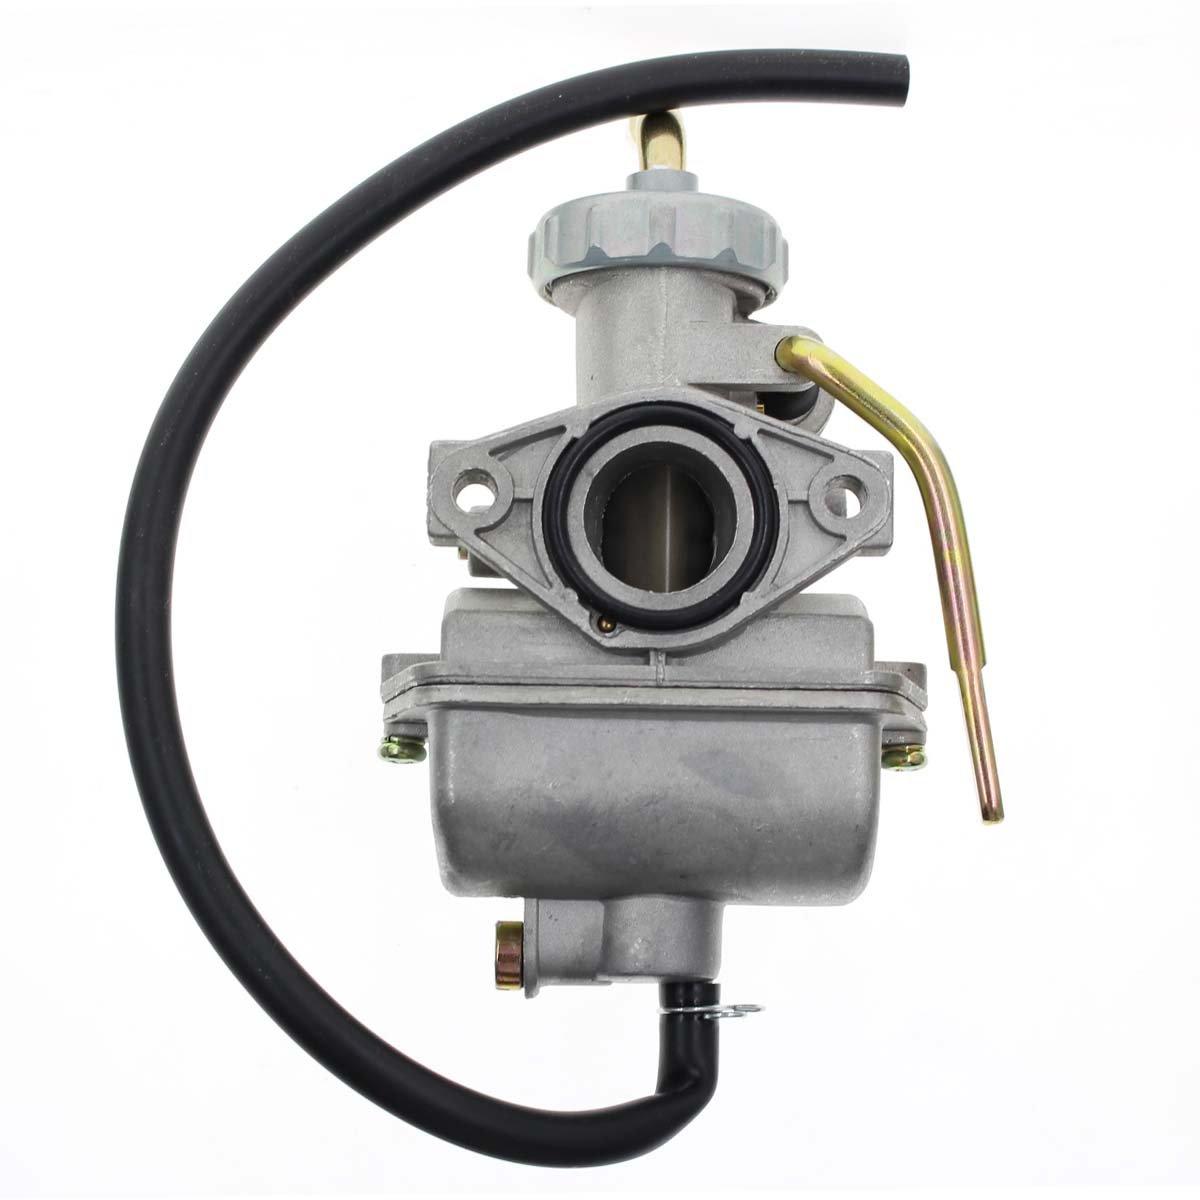 Carbhub Pz20 Carburetor For Kazuma Baja 50cc 70cc 90cc 110cc 125cc 4 Wheeler Fuel Filter Taotao 110b Nst Sunl Chinese